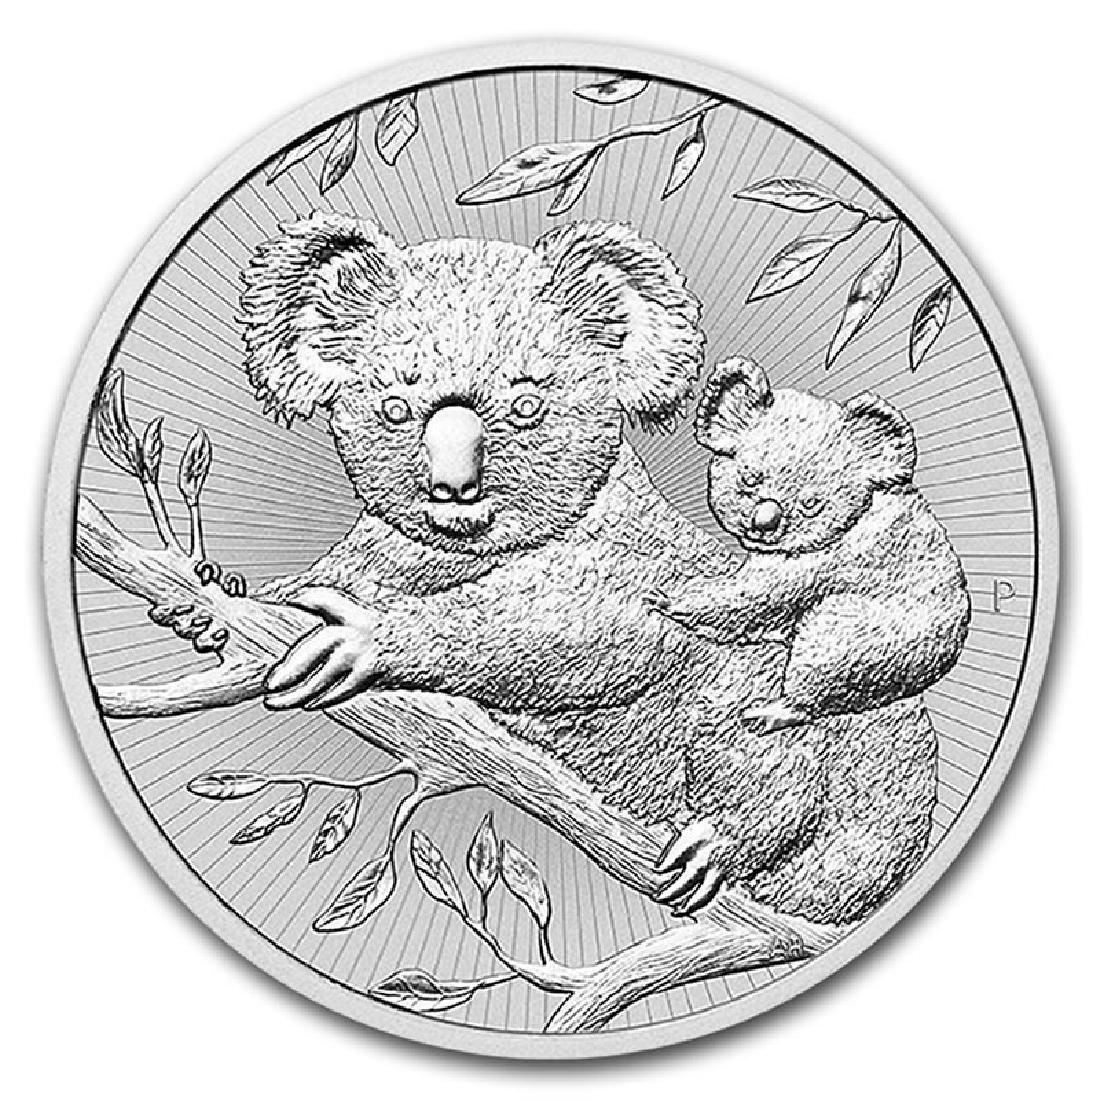 Australian Koala 2 Ounce Silver 2018